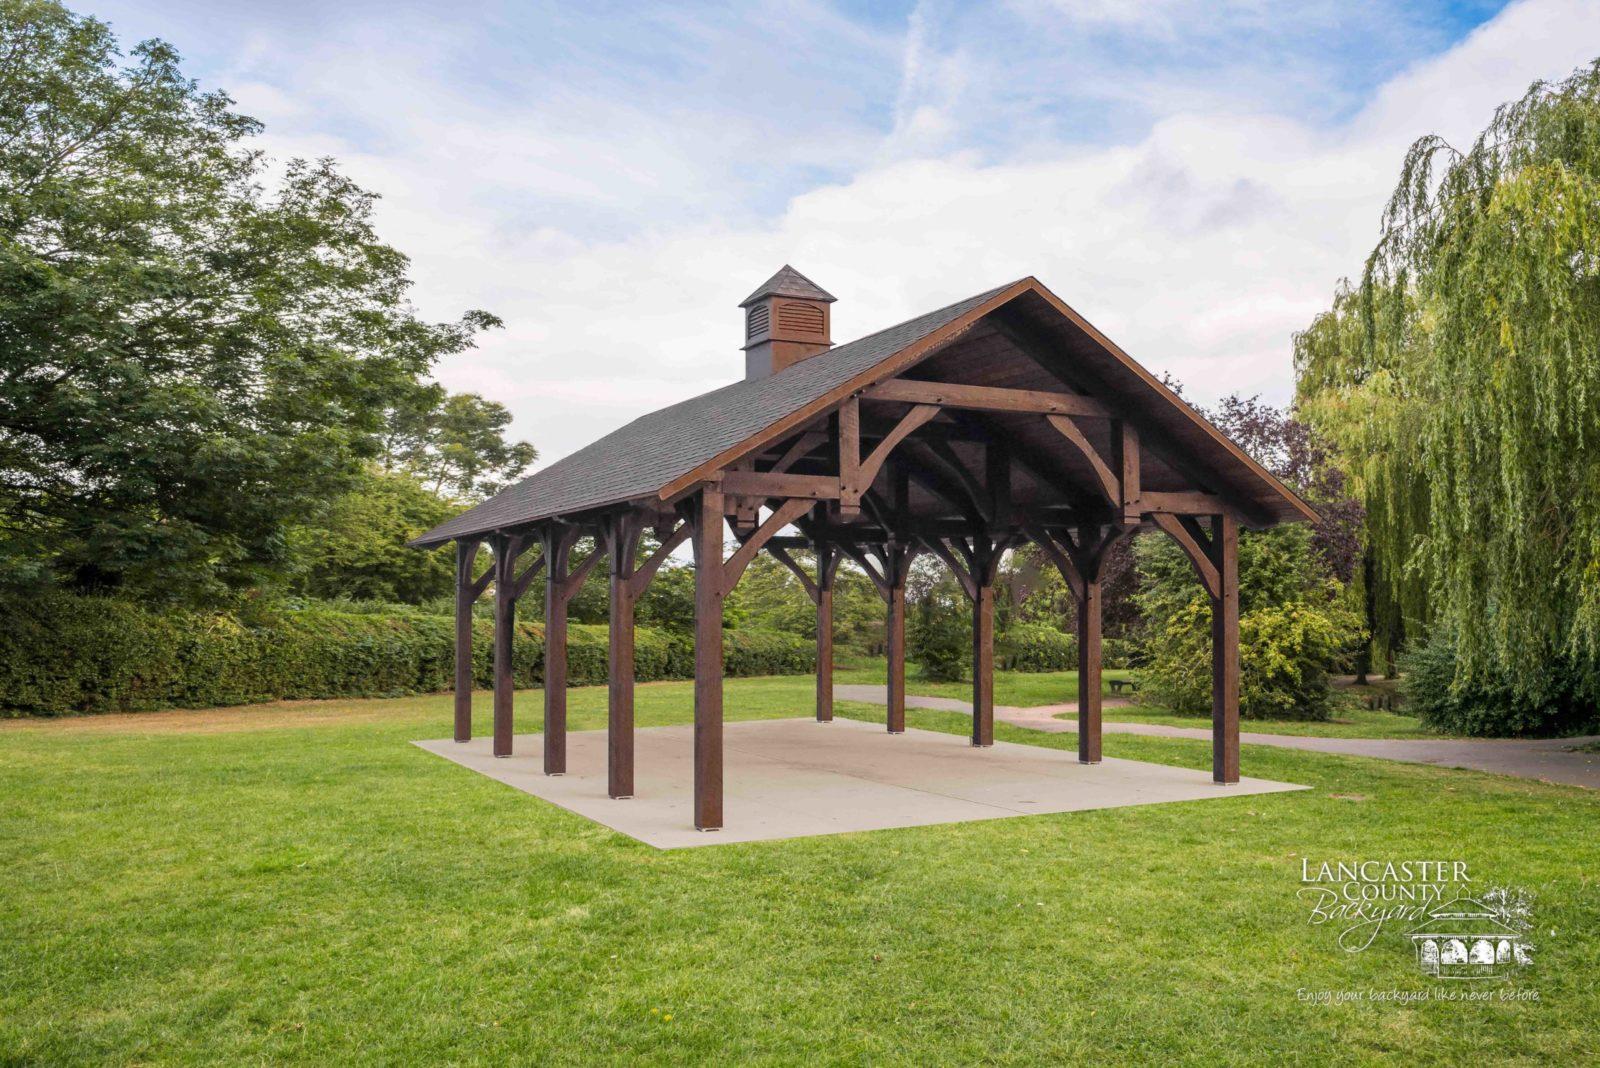 denali timber frame outdoor pavilion for events